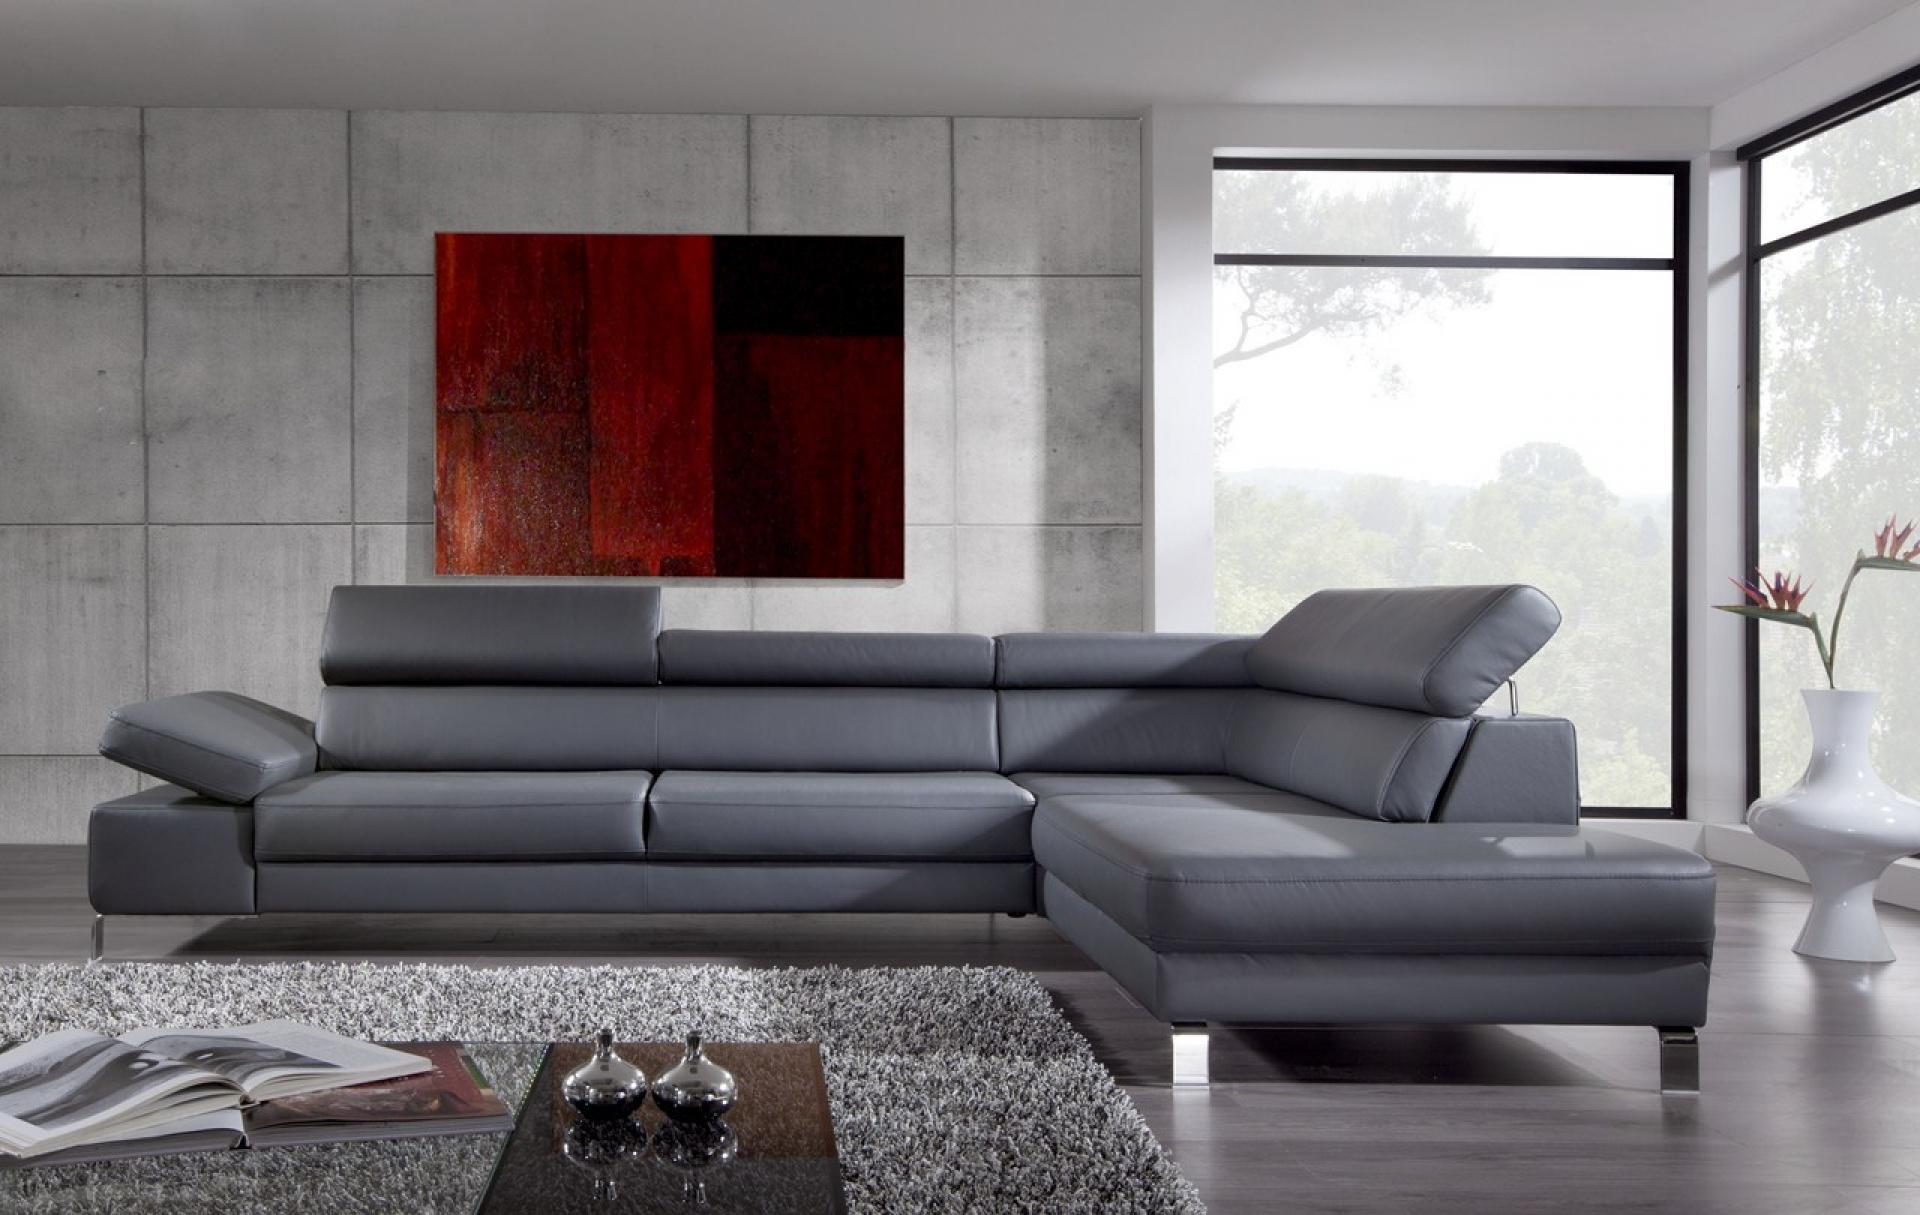 photos canap d 39 angle design. Black Bedroom Furniture Sets. Home Design Ideas